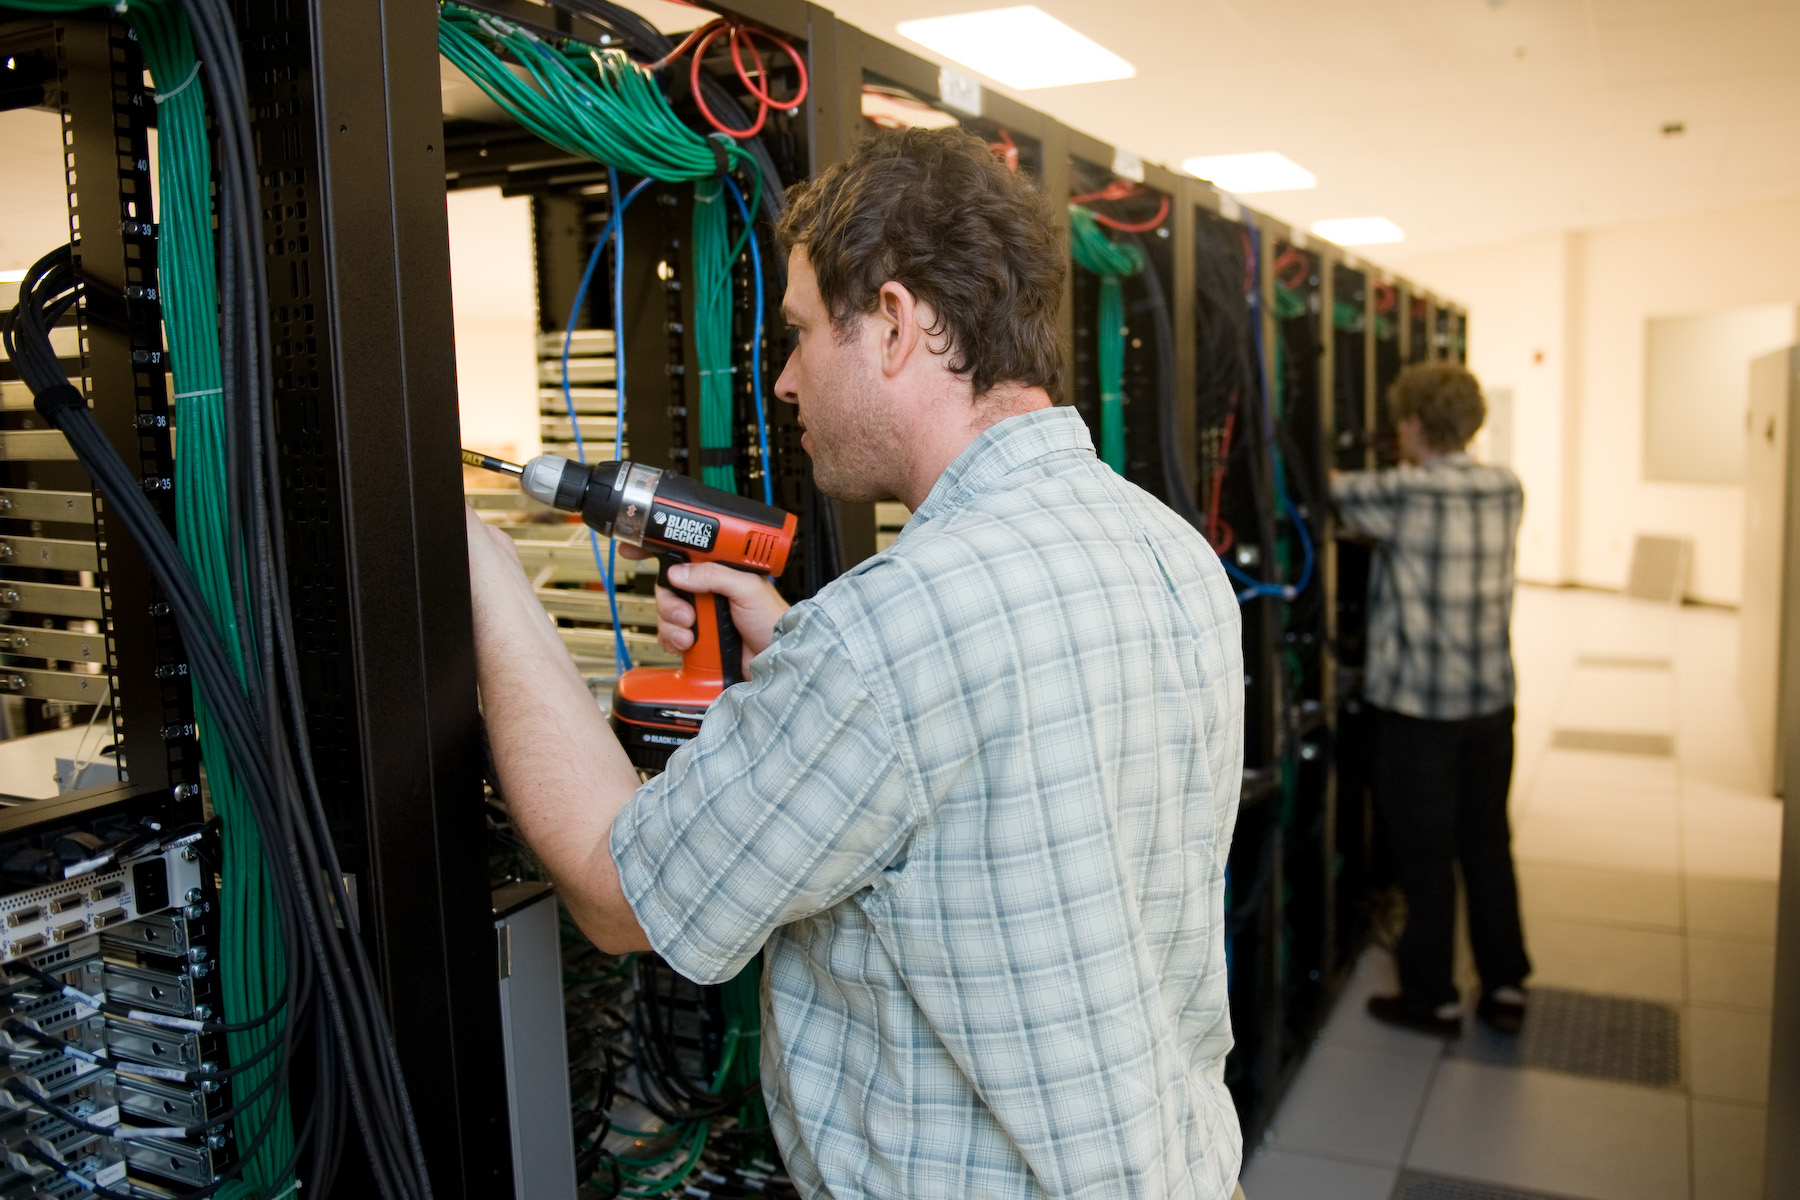 2010 Computer Installation, Computer Center